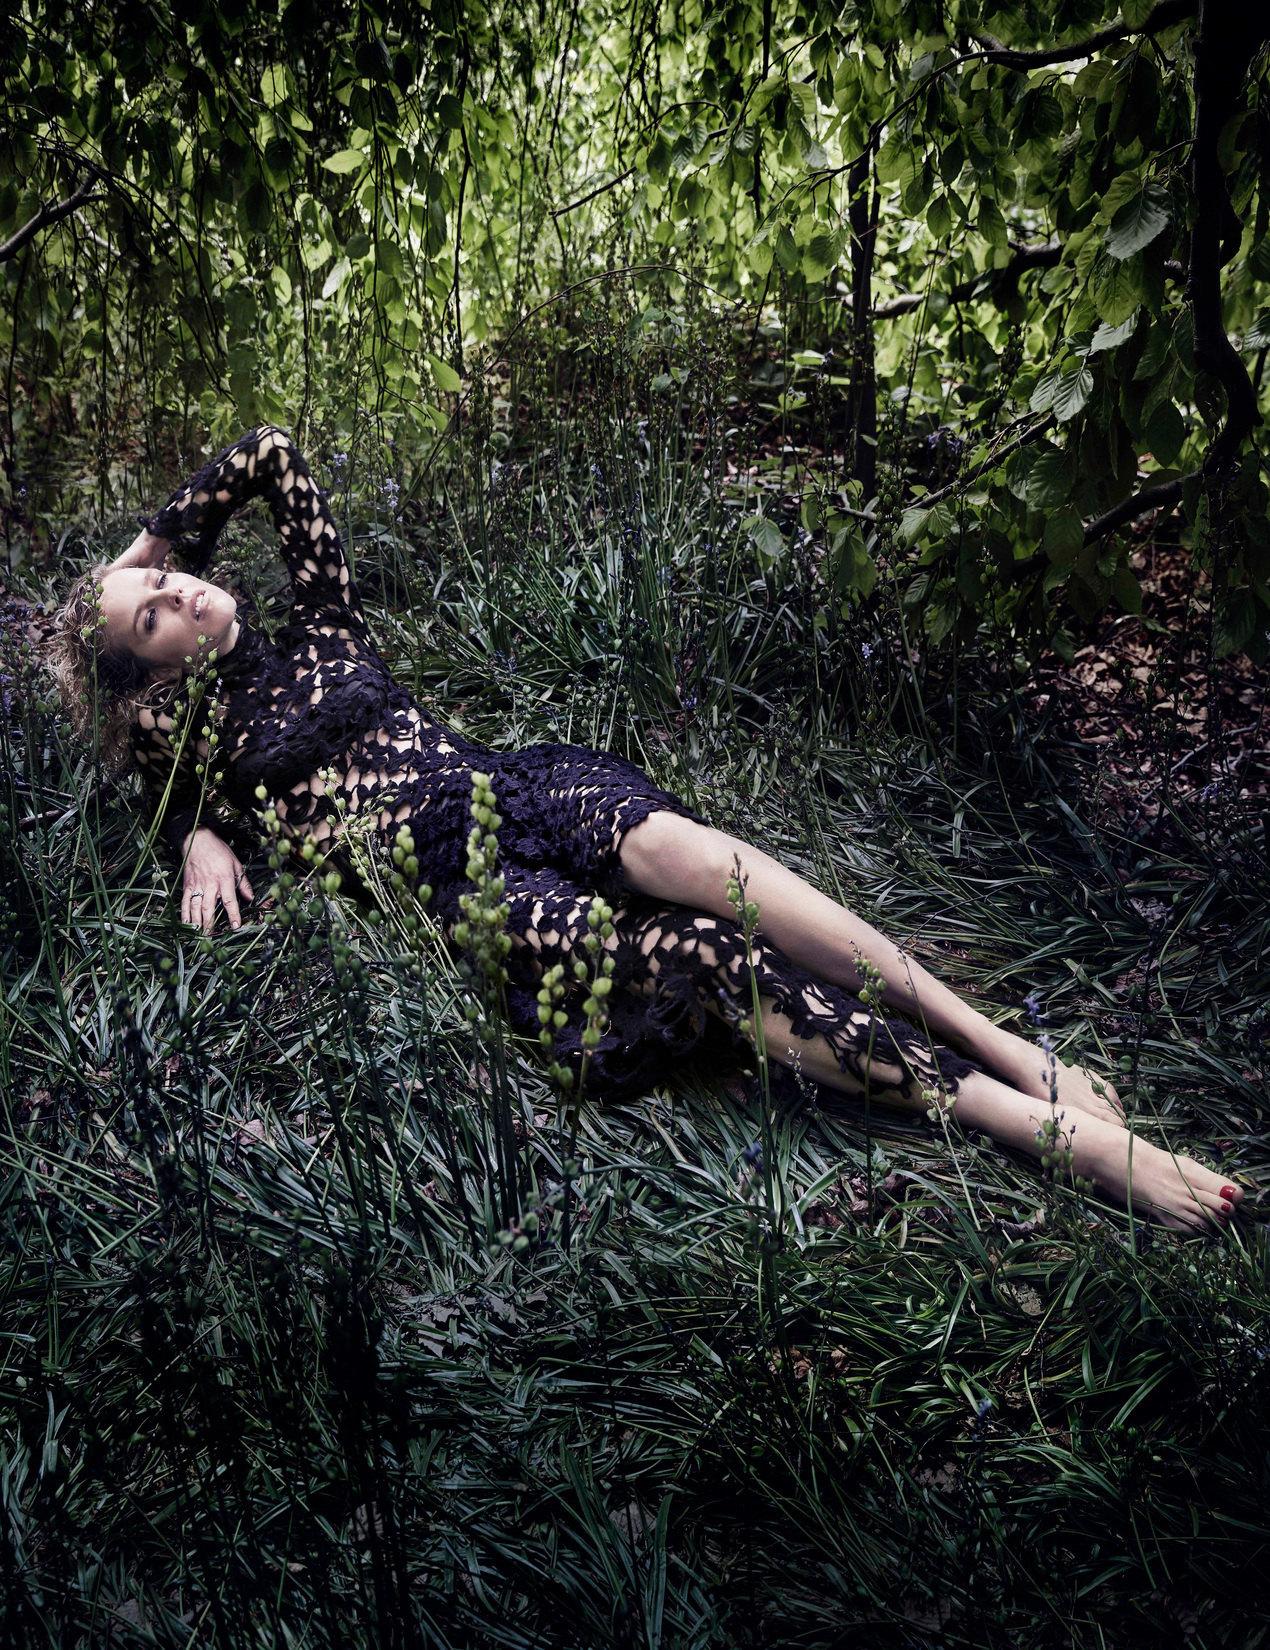 https://pics.wikifeet.com/Eva-Herzigova-Feet-1809616.jpg